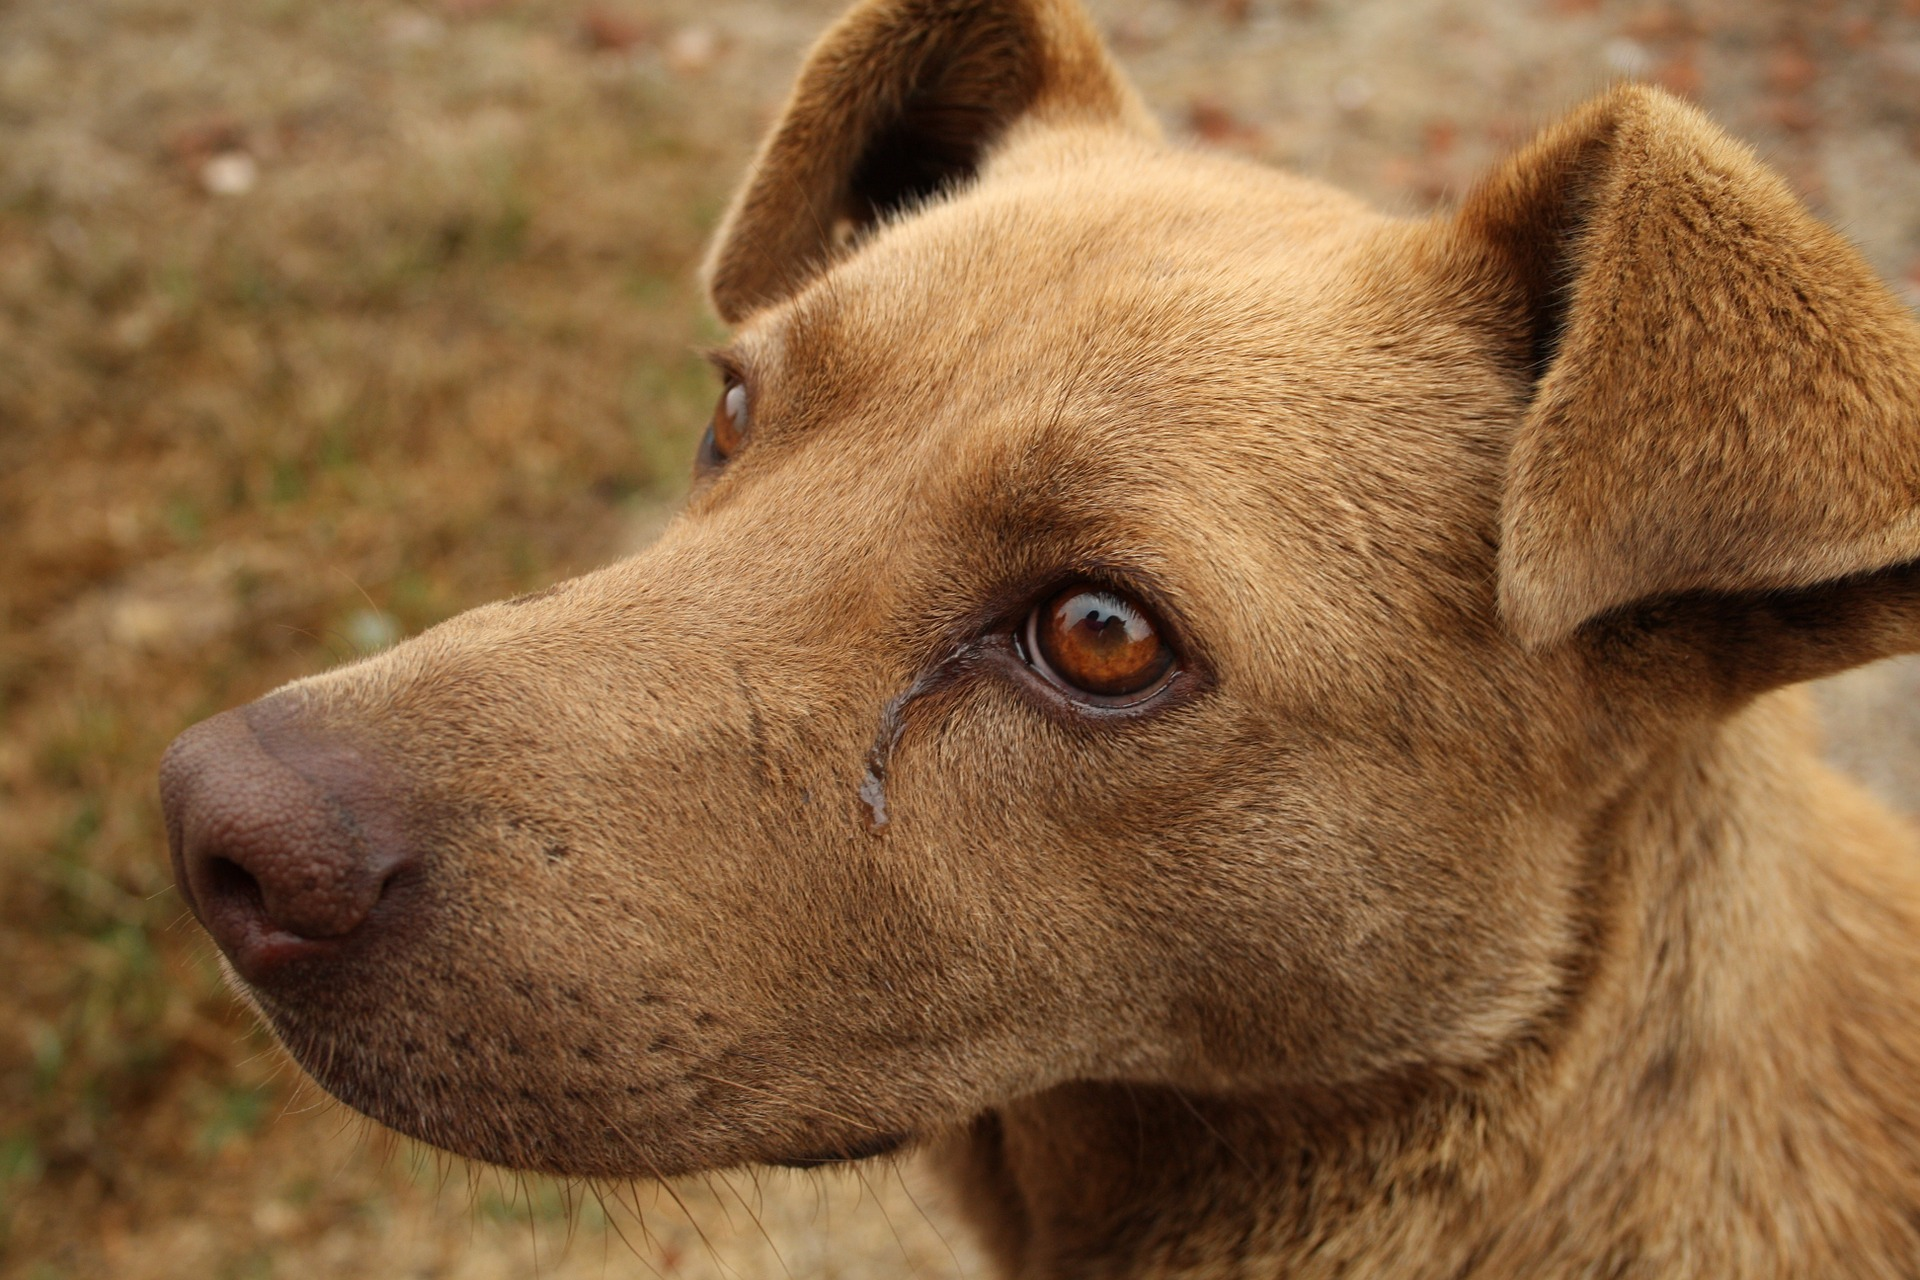 canine-1475738_1920.jpg